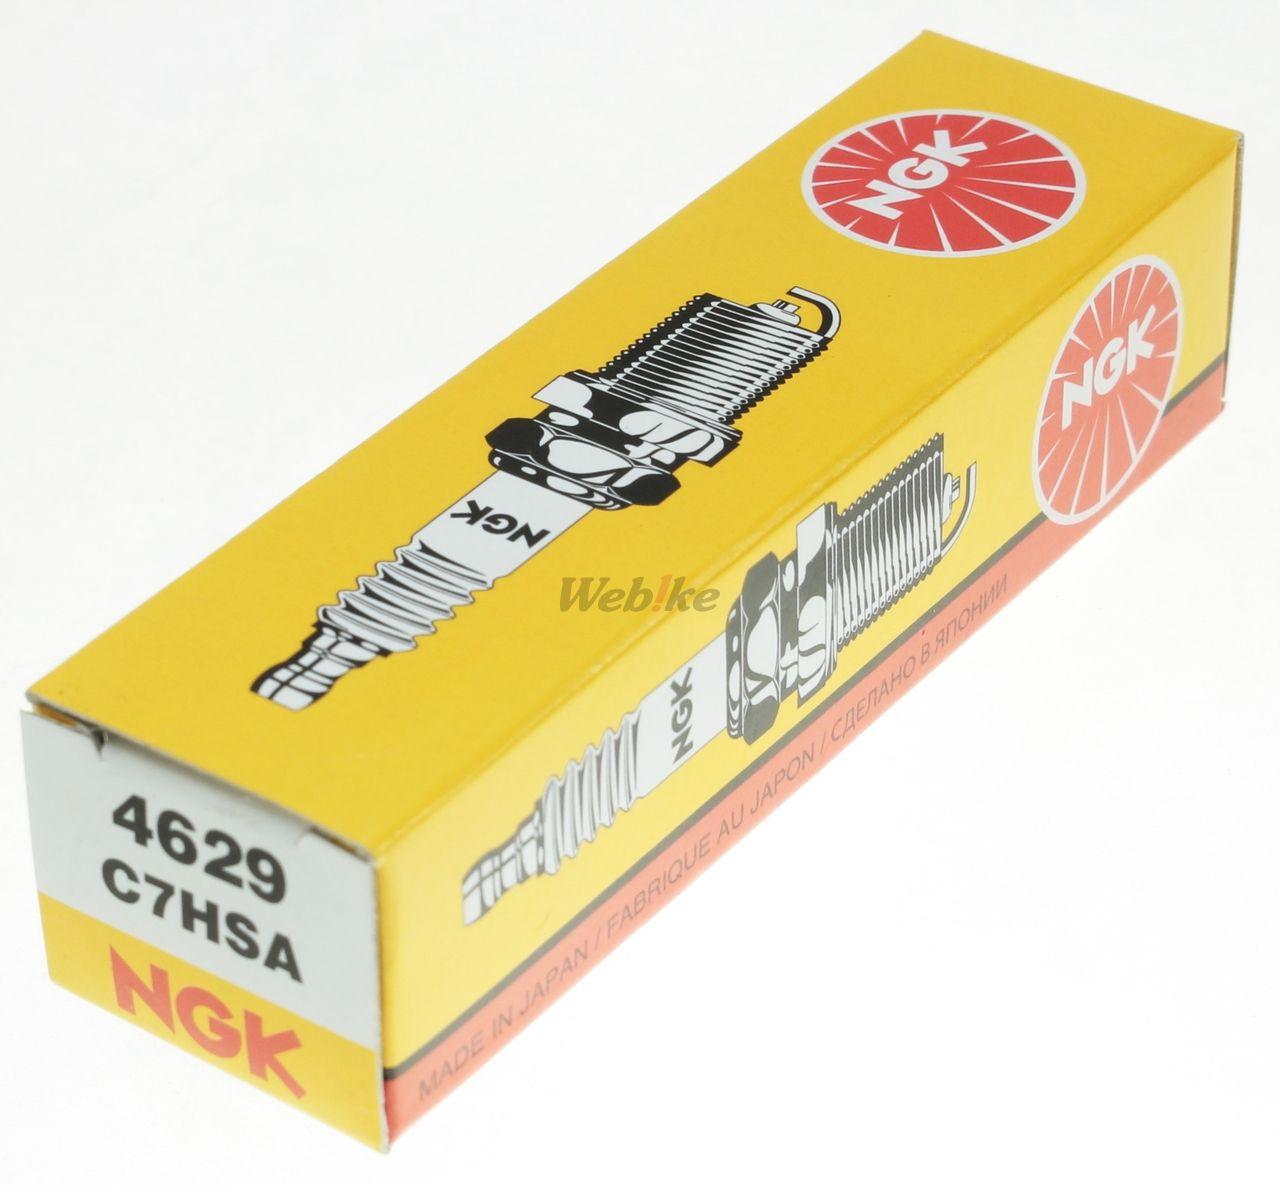 【NGK】標準型 火星塞 C7HSA 4629 - 「Webike-摩托百貨」